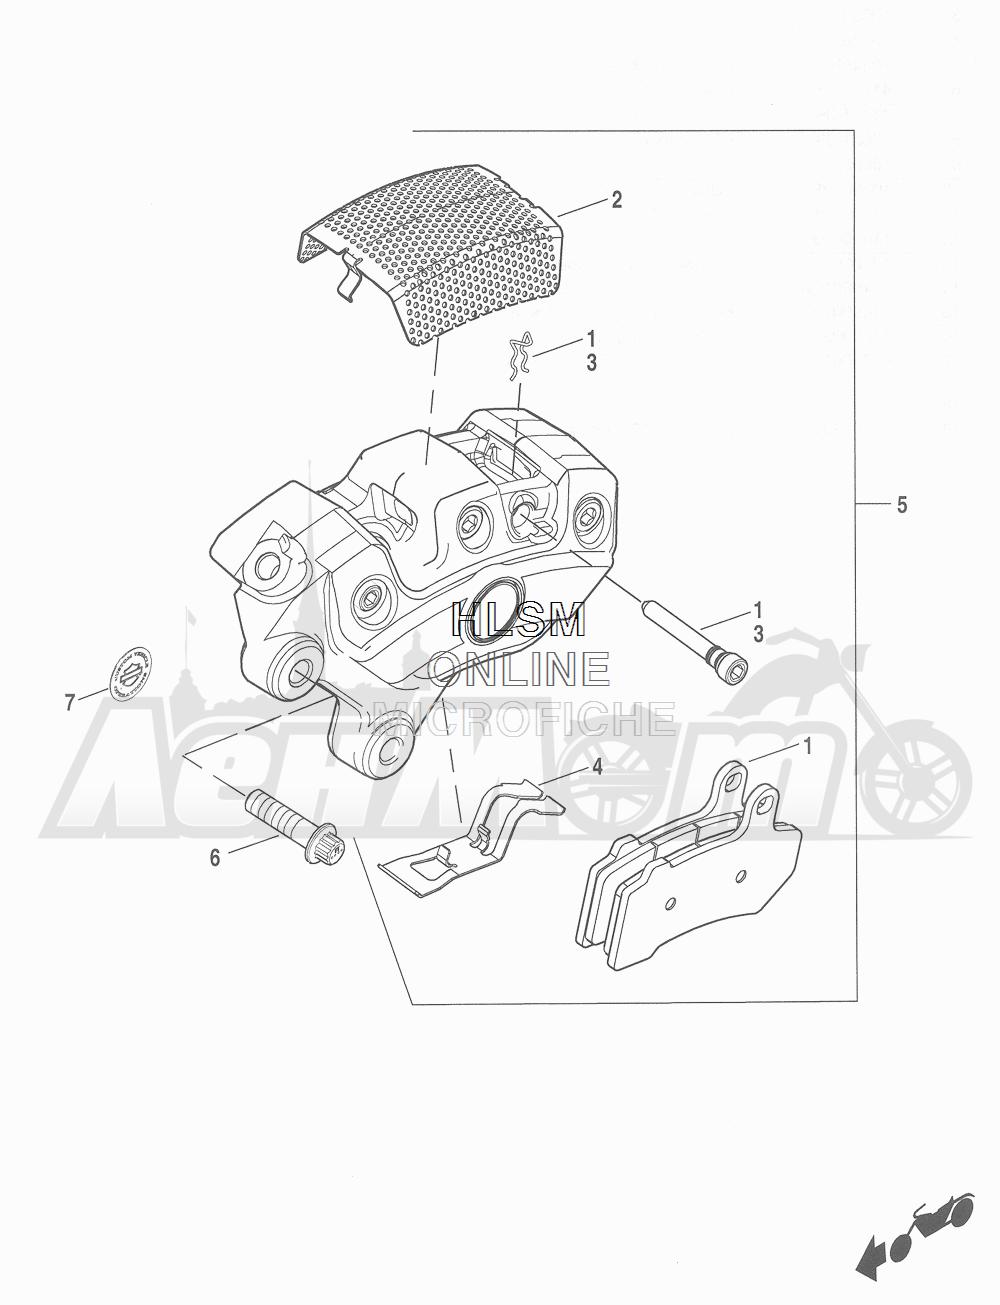 Запчасти для Мотоцикла Harley-Davidson 2016 CVO ROAD GLIDE ULTRA (TA) Раздел: BRAKE - FRONT BRAKE CALIPER ASSEMBLY | передний тормоз тормозной суппорт в сборе